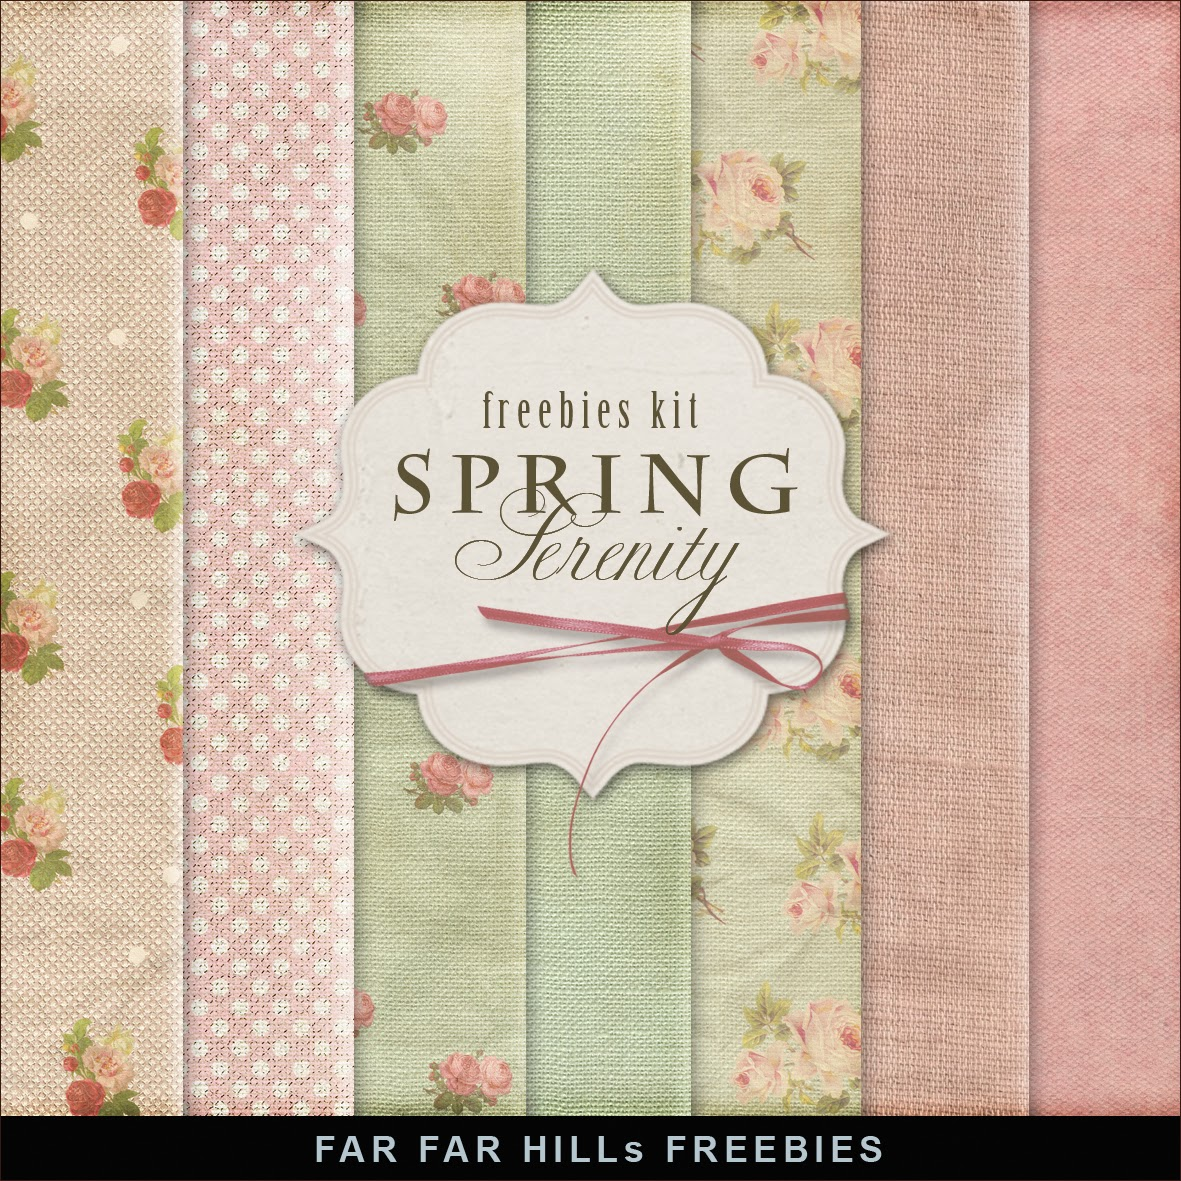 Freebies Kit of Background - Spring Serenity